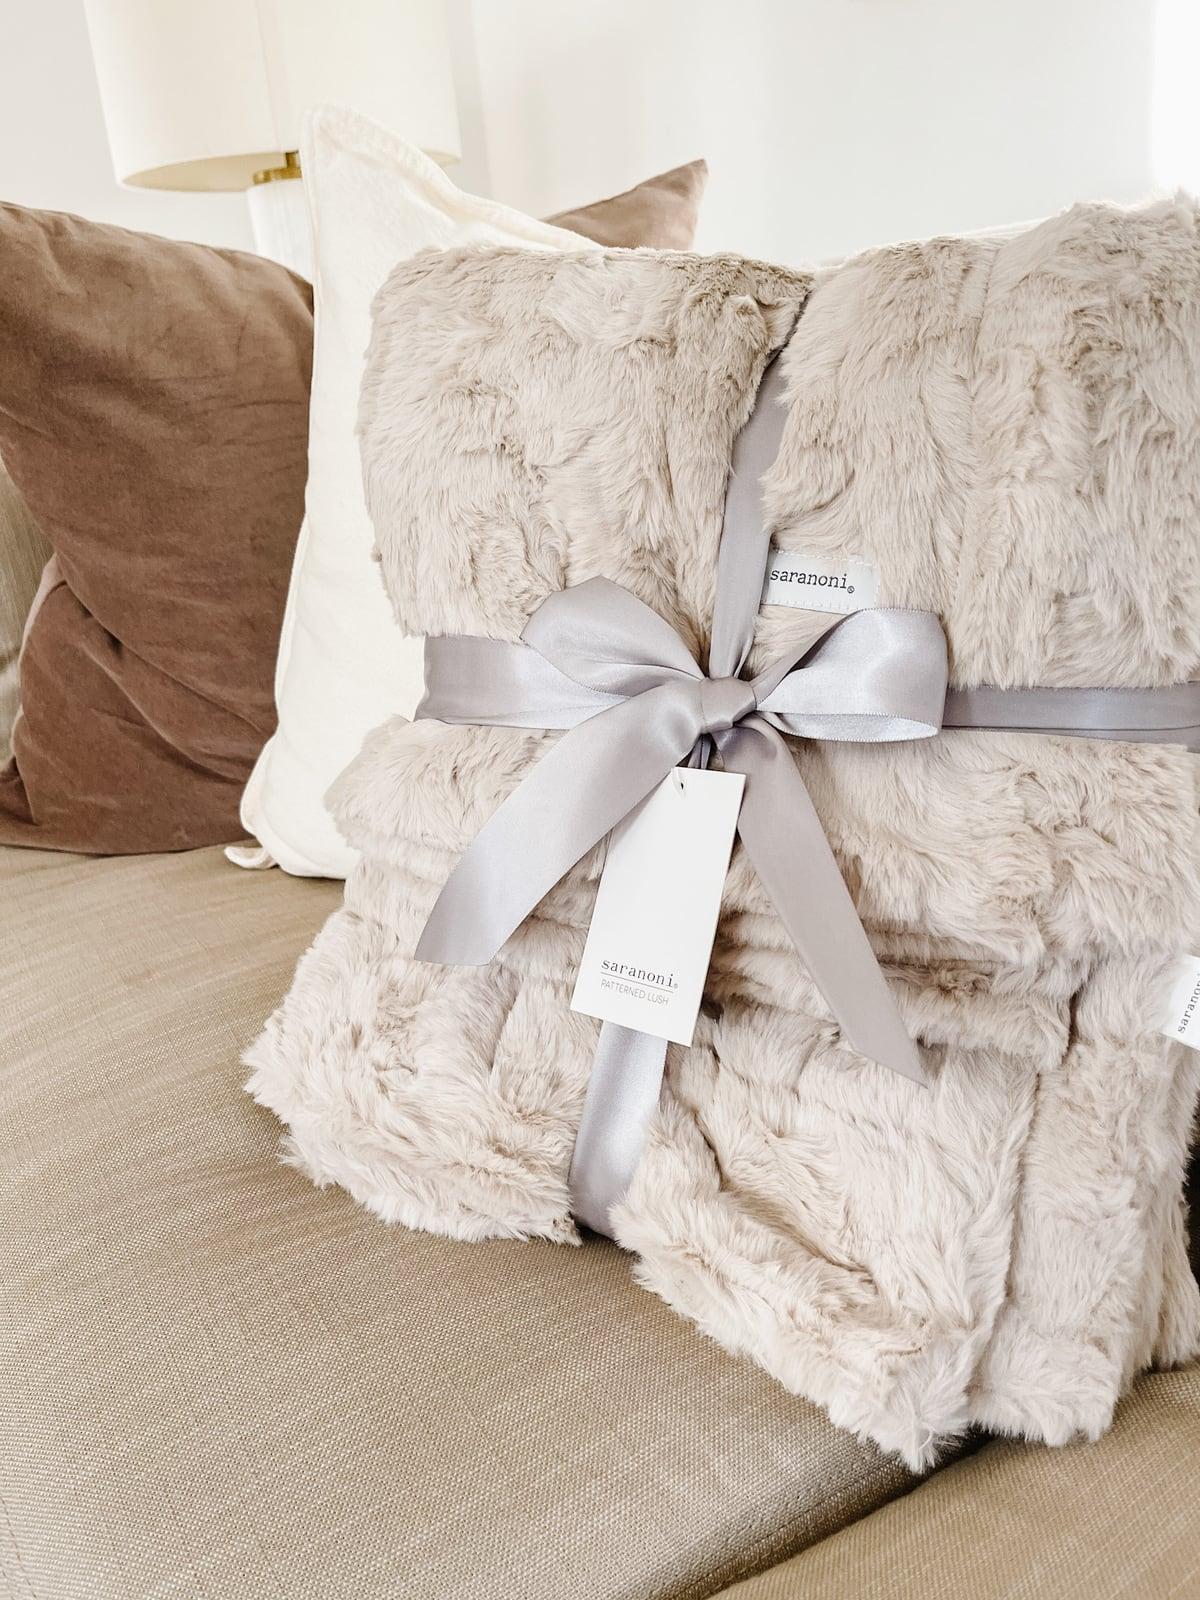 saranoni blanket deals